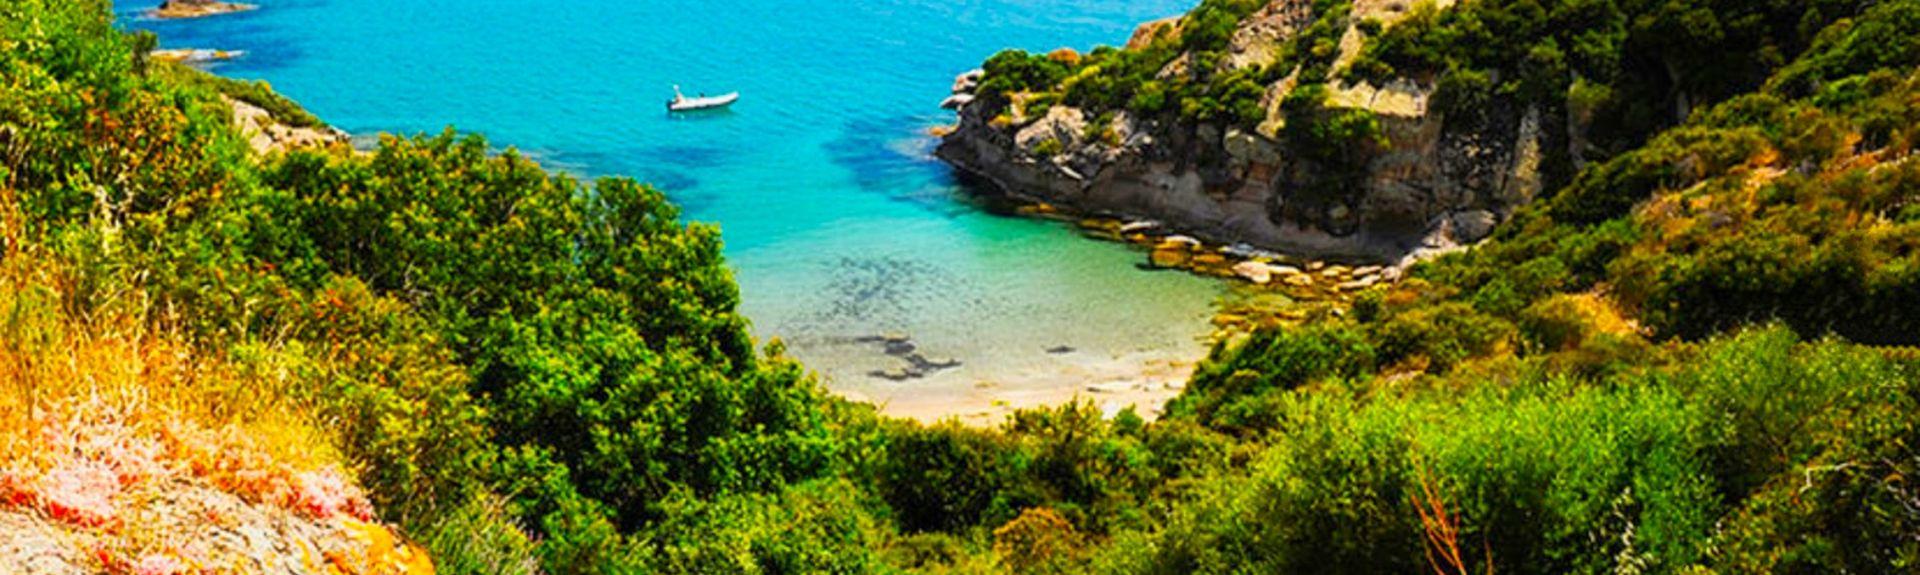 Strand San Giovanni, Alghero, Sardinien, Italien